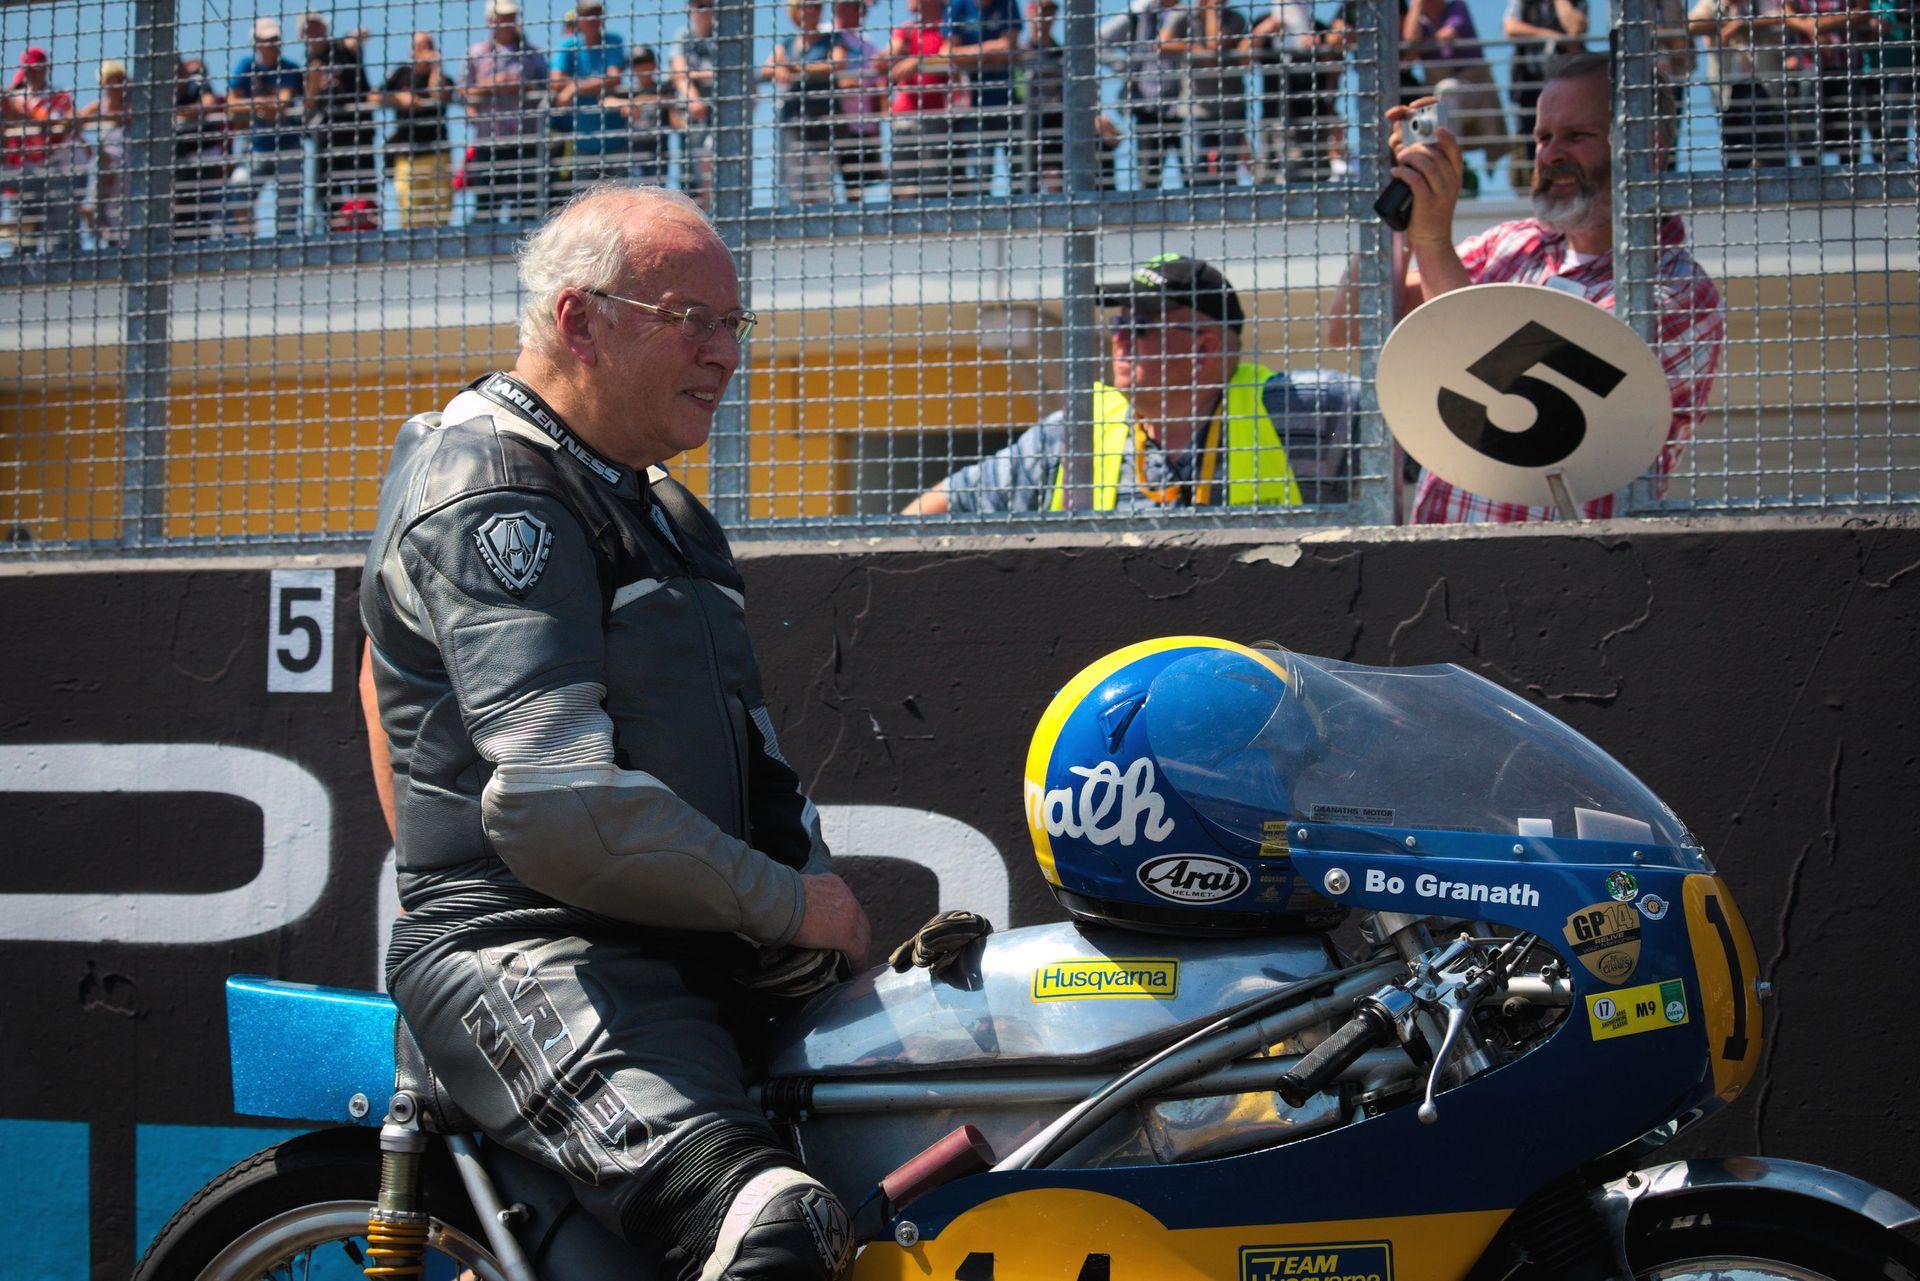 Bo Granath zur Sachsenring Classic 2017